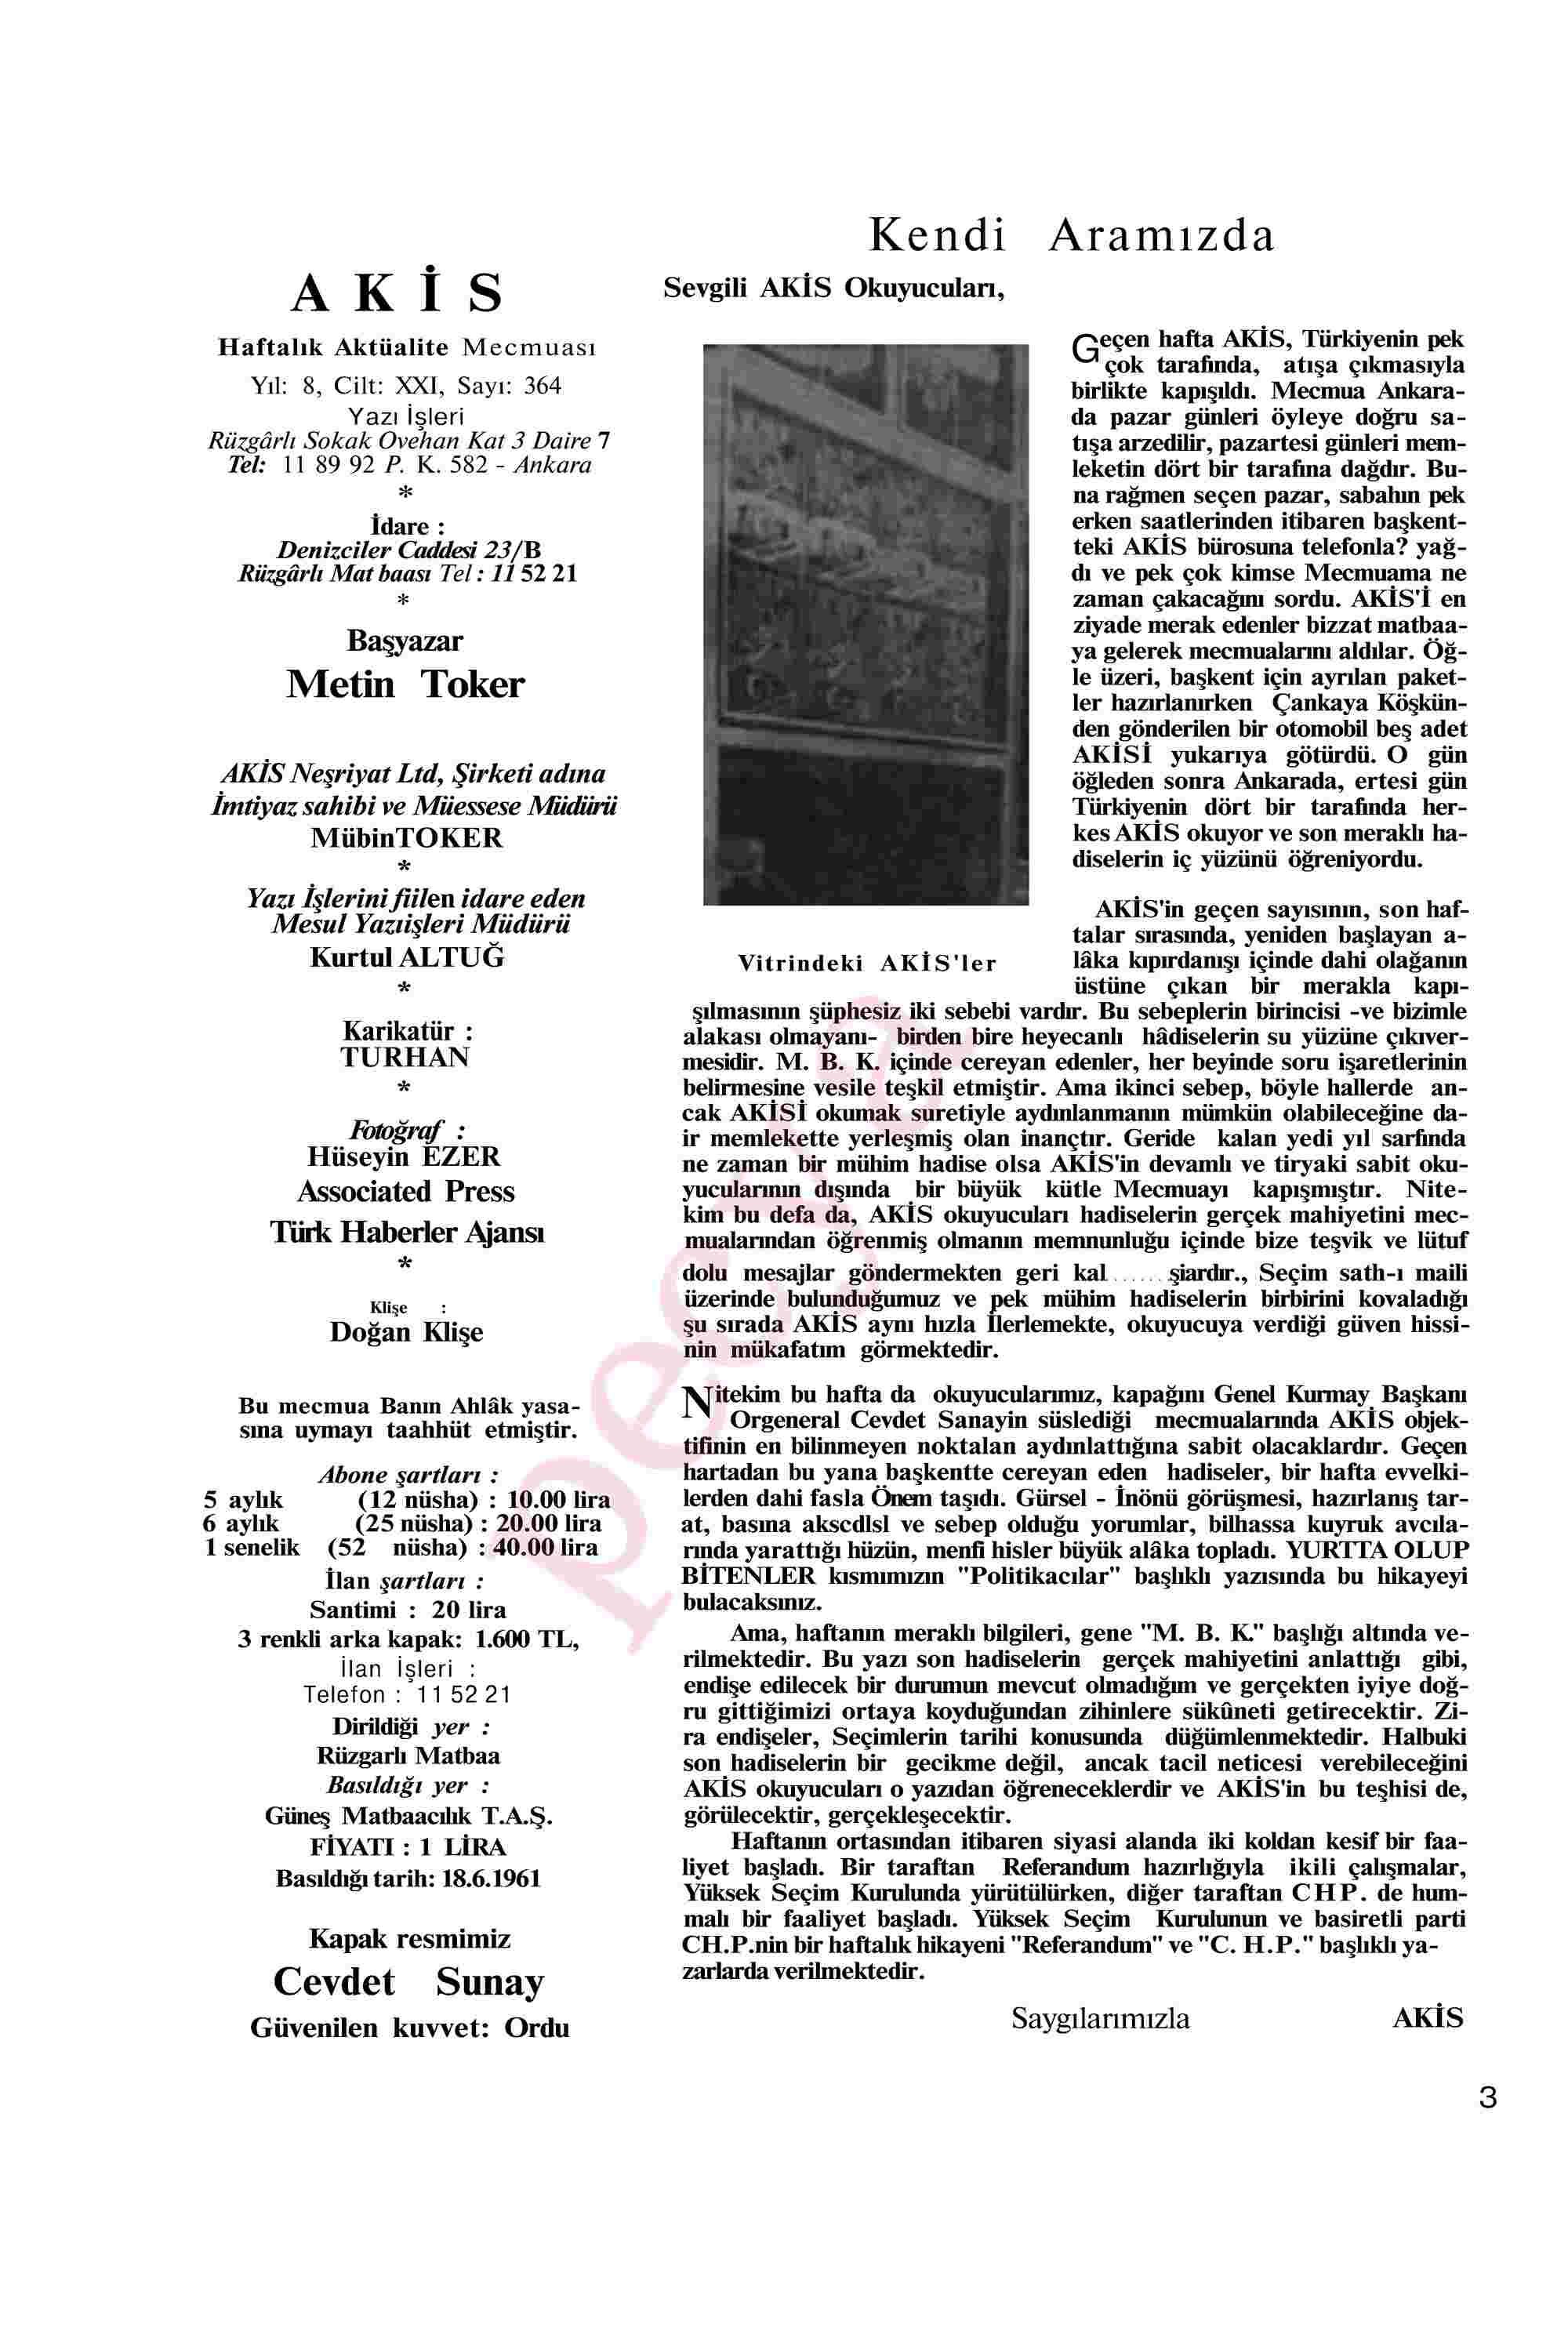 19 Haziran 1961 Tarihli Akis Dergisi Sayfa 3